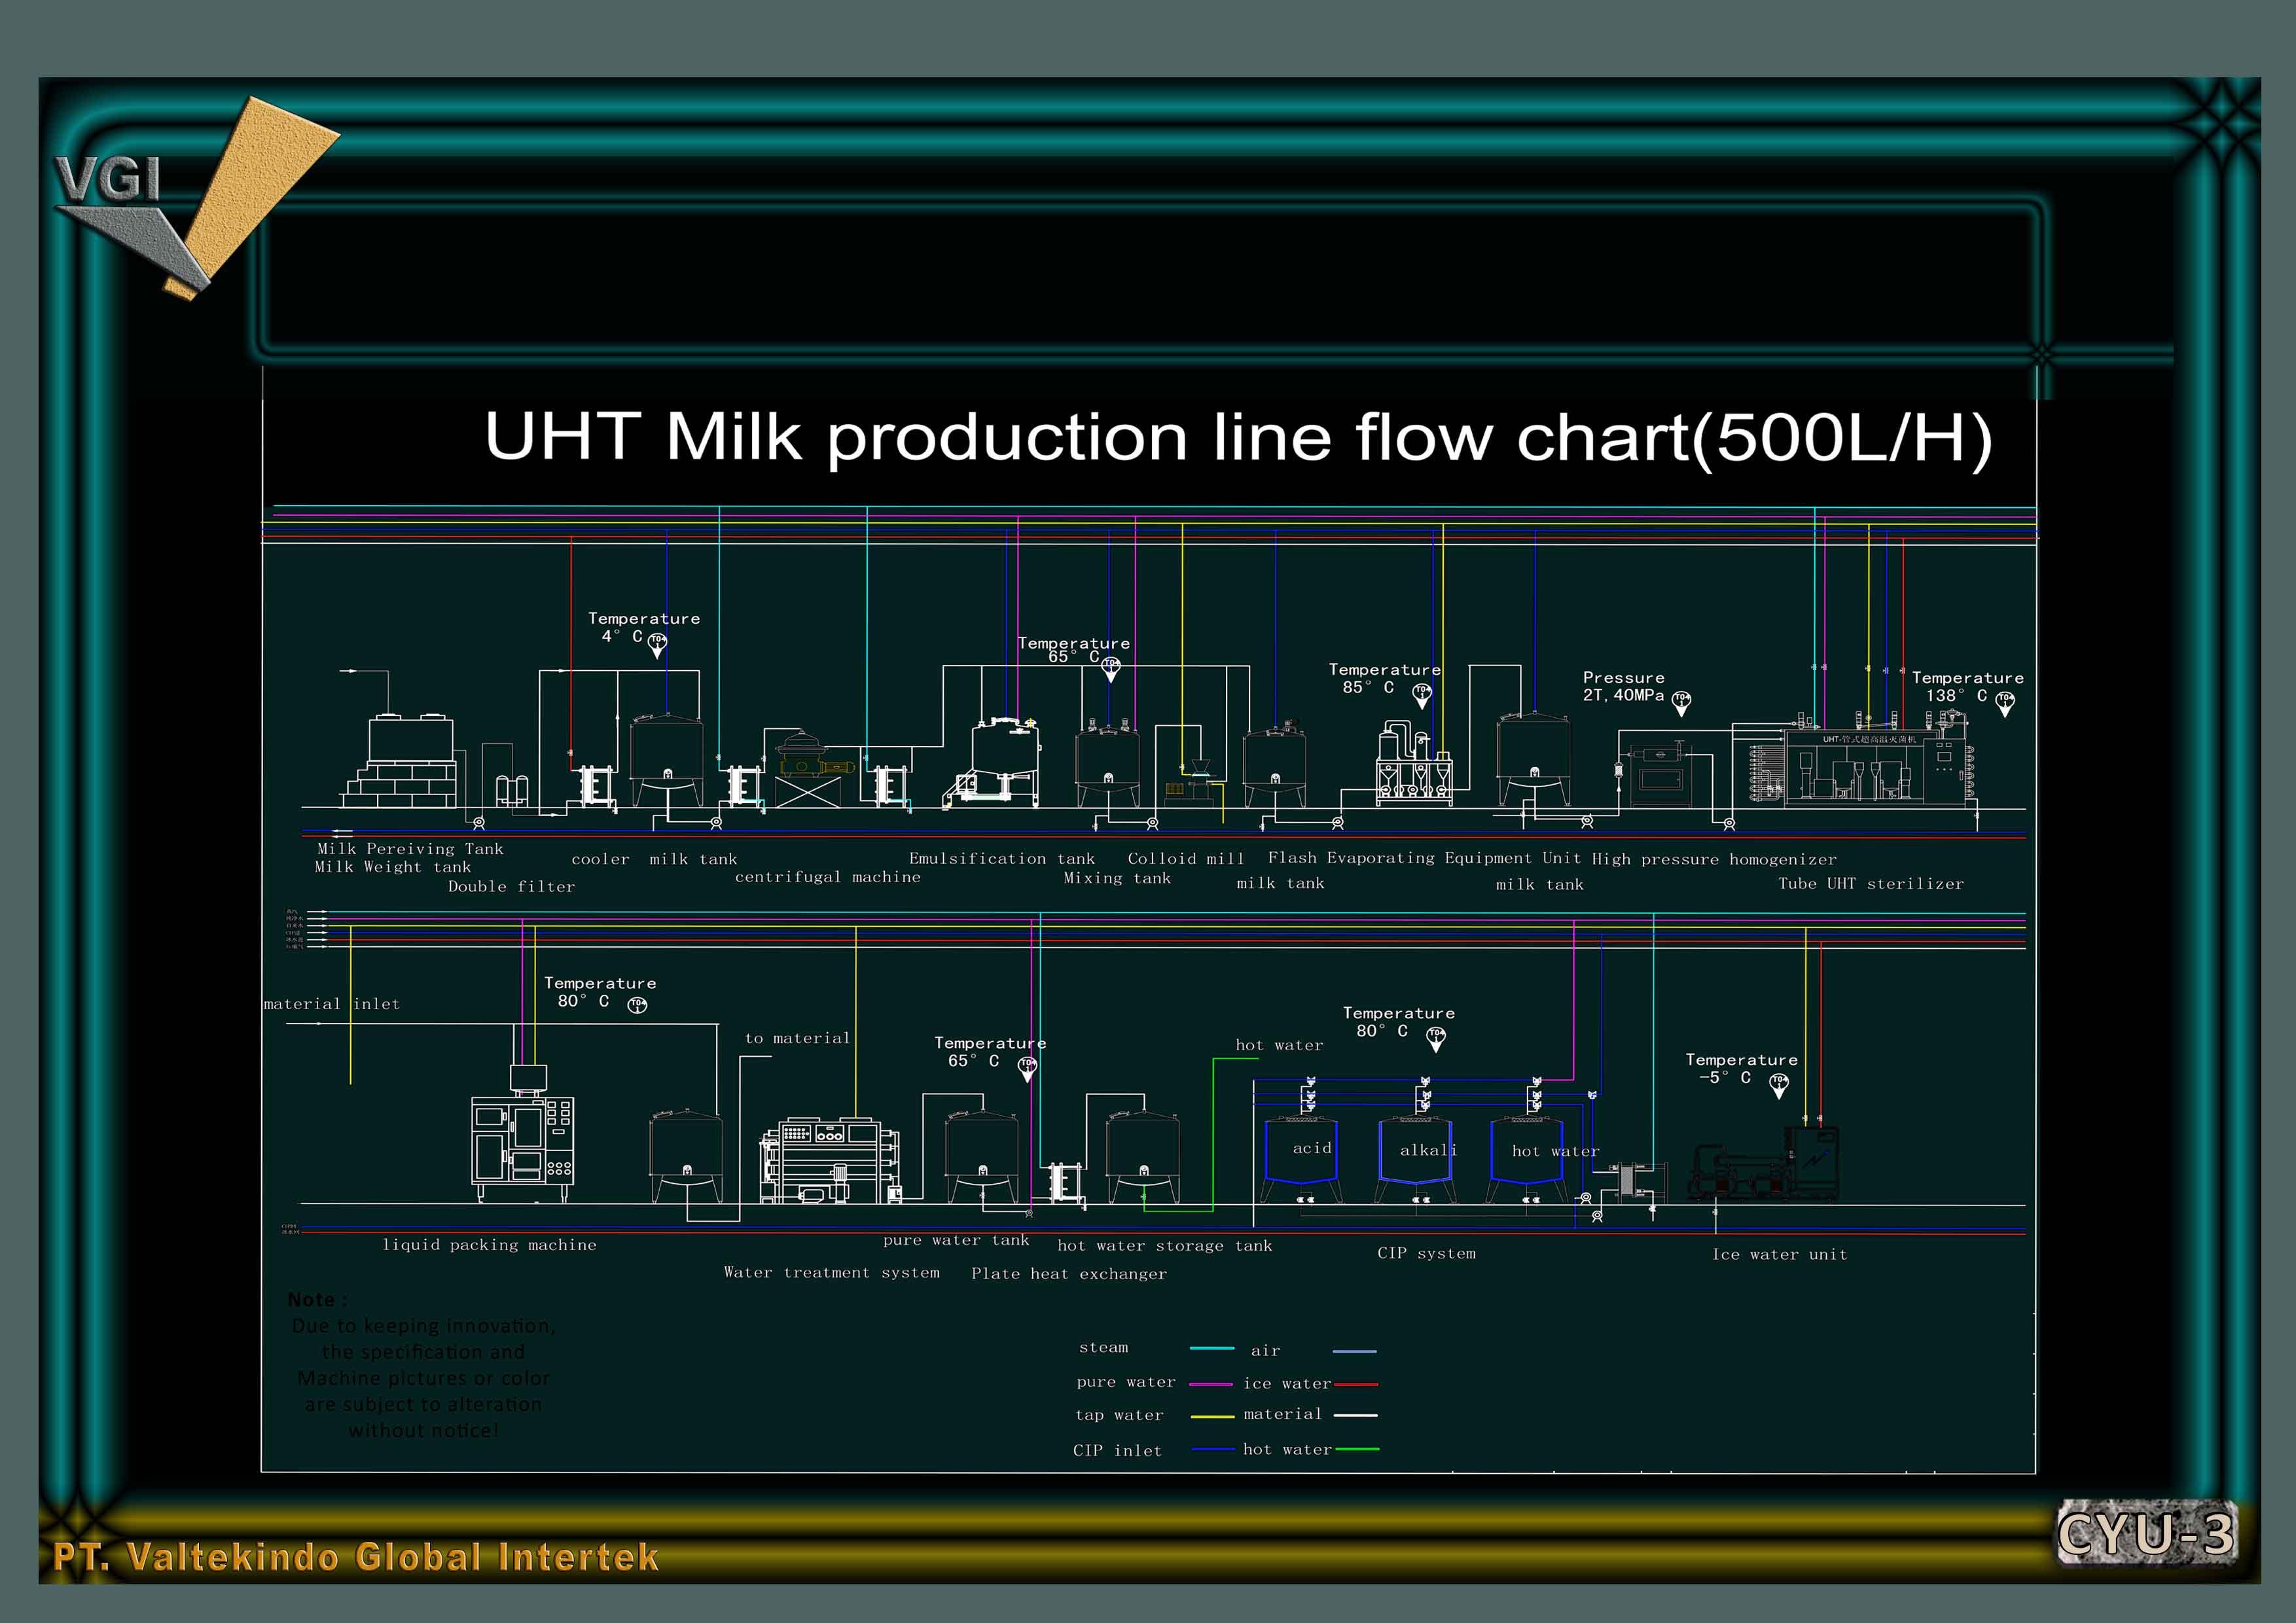 jual mesin, harga mesin, jual mesin bandung, distributor mesin, jual mesin karet, daur ulang karet, daur ulang plastik, mesin pertanian UHT Milk  Flow Chart 500LPH UHT Milk  Flow Chart 500LPH